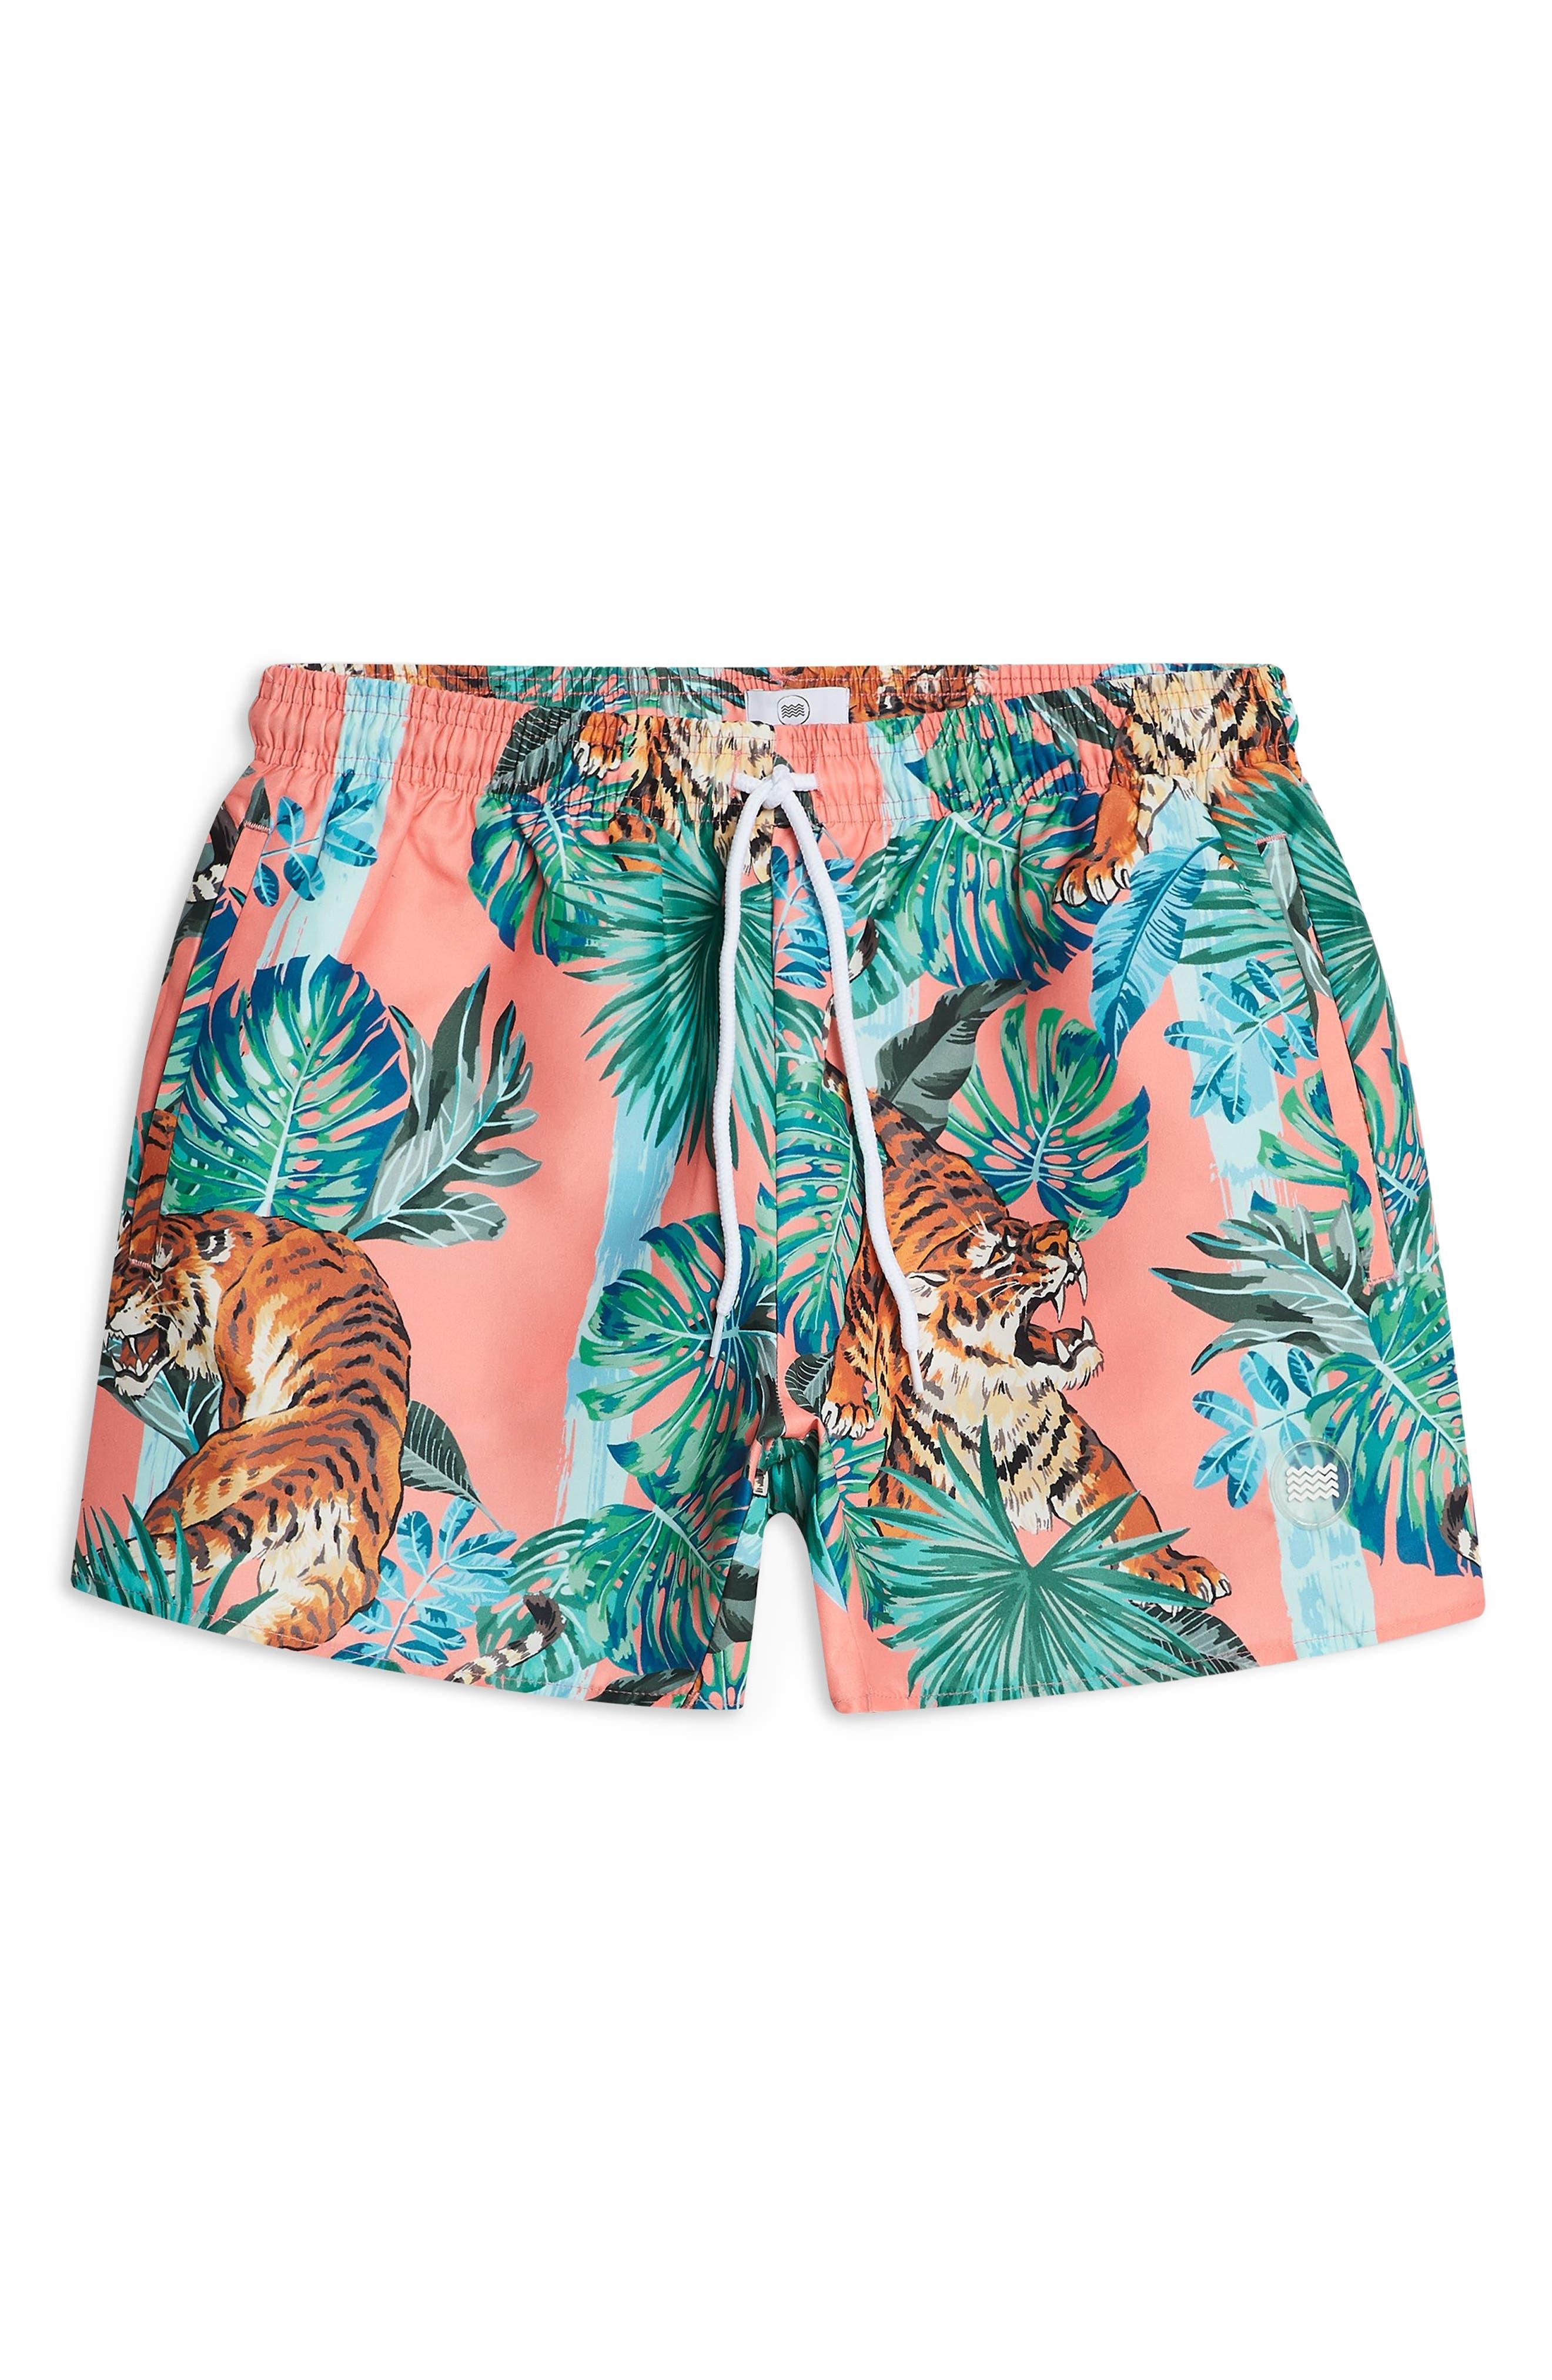 Tiger Print Swim Shorts,                             Main thumbnail 1, color,                             PINK MULTI